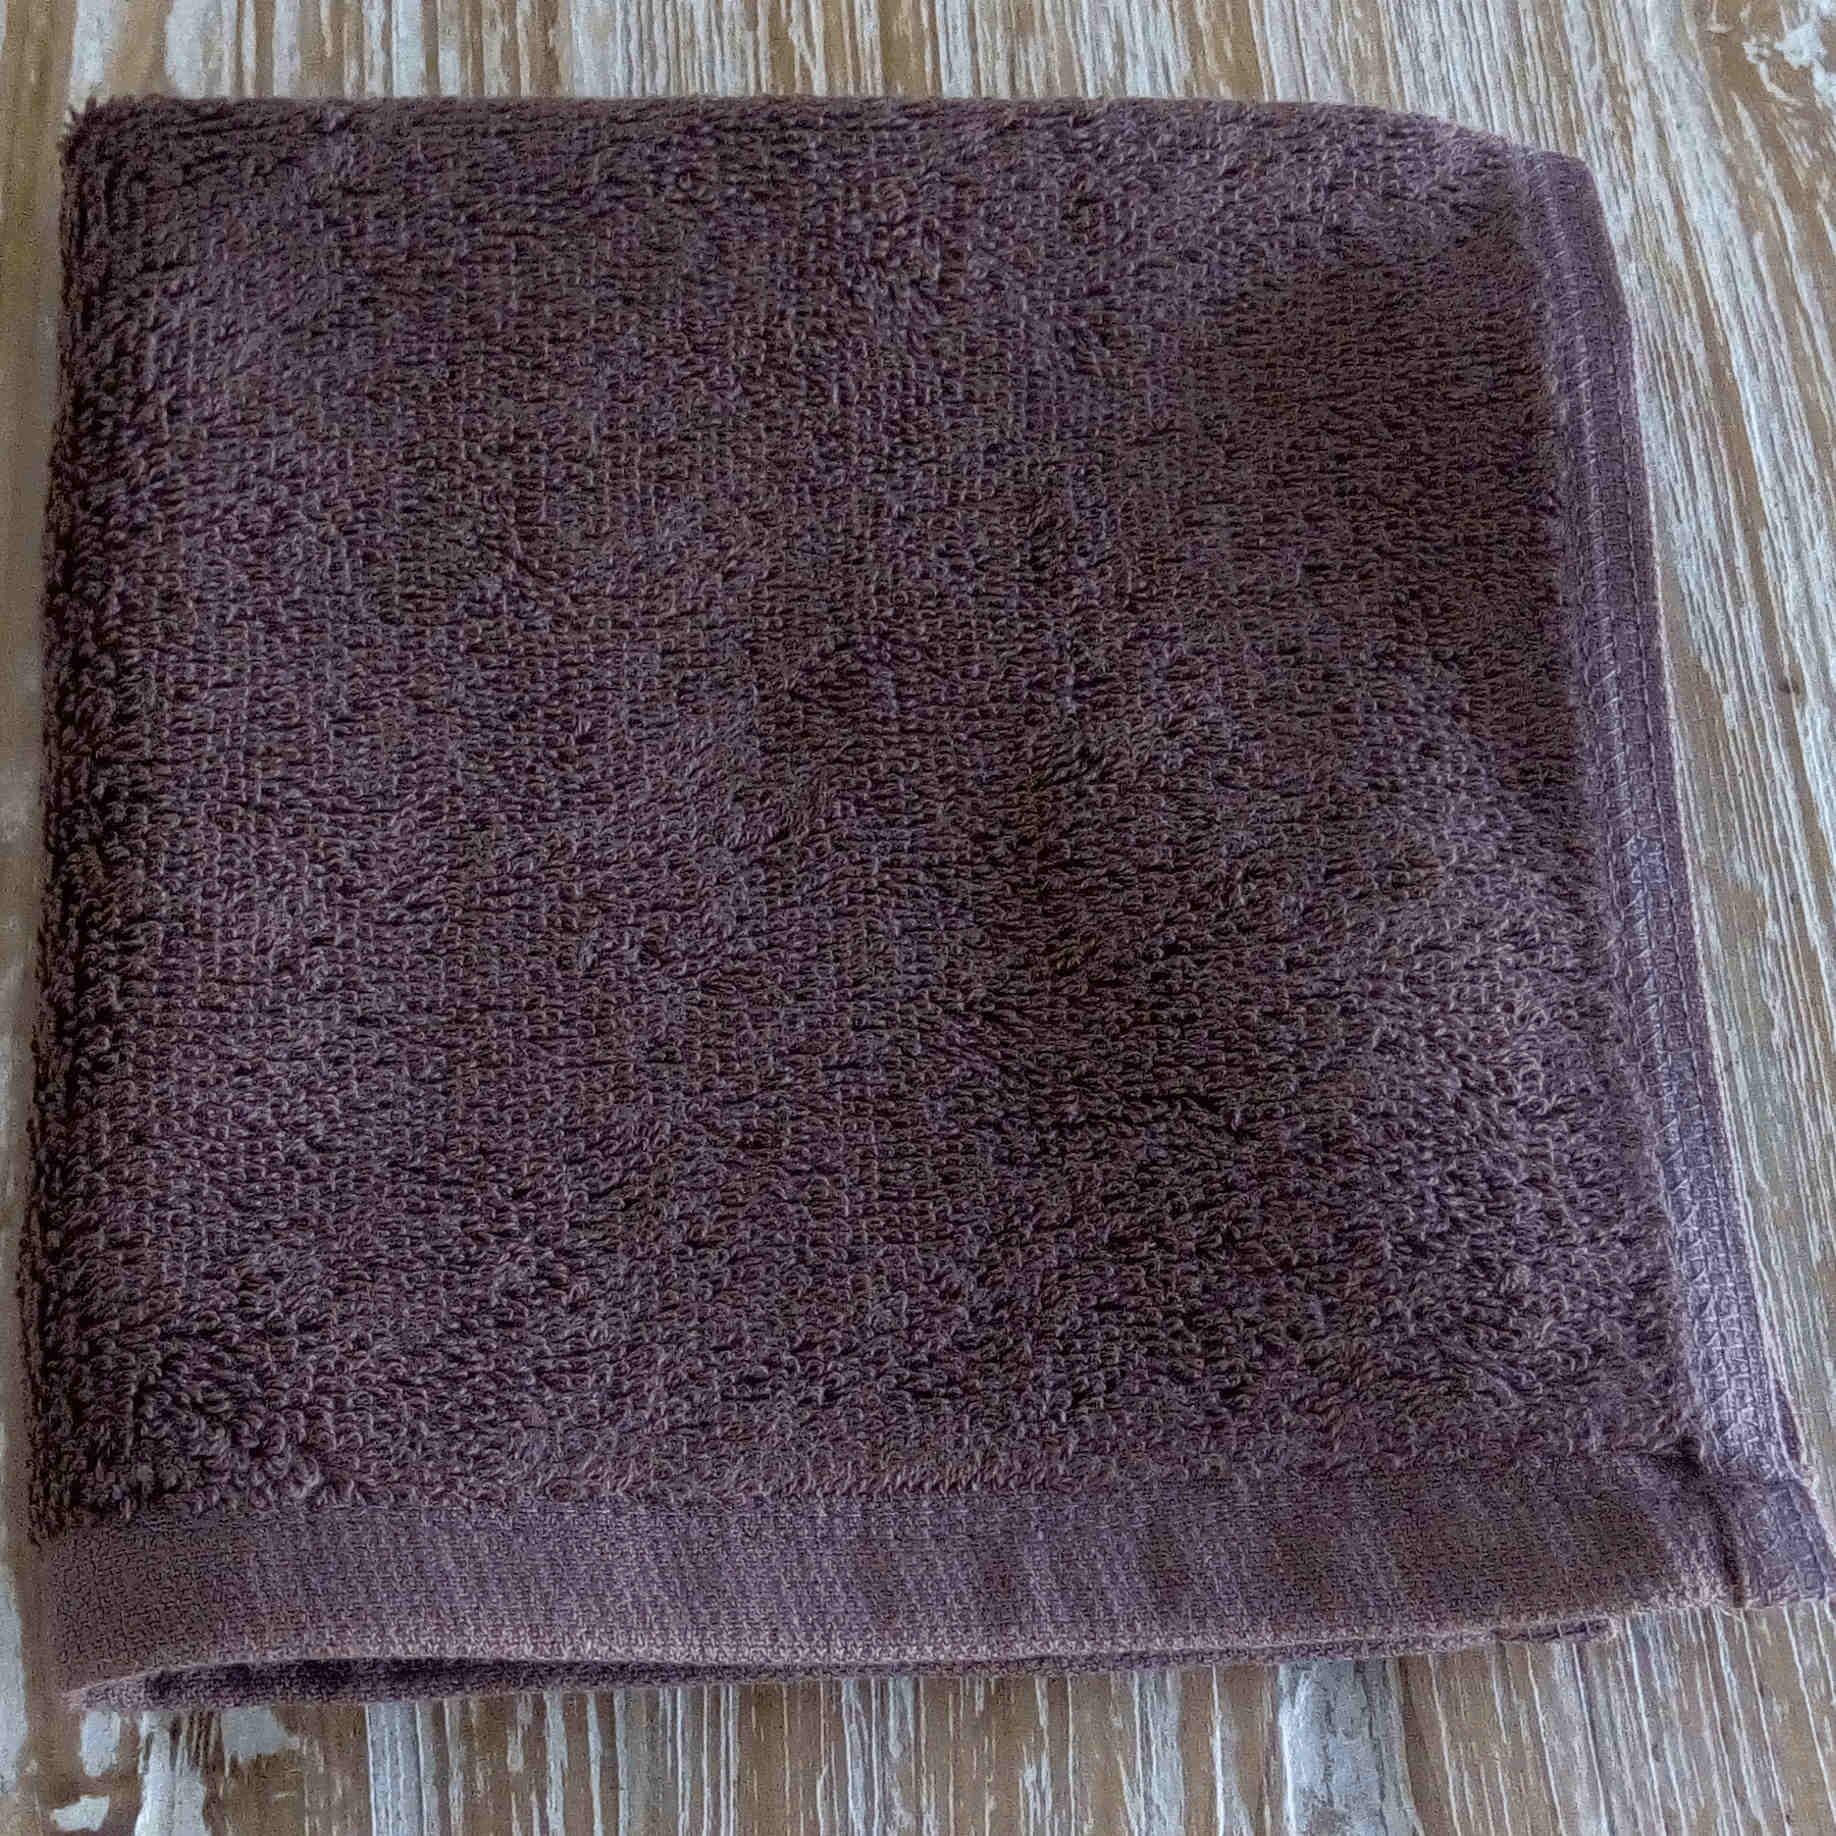 Face Towel - Brown - BaliOz